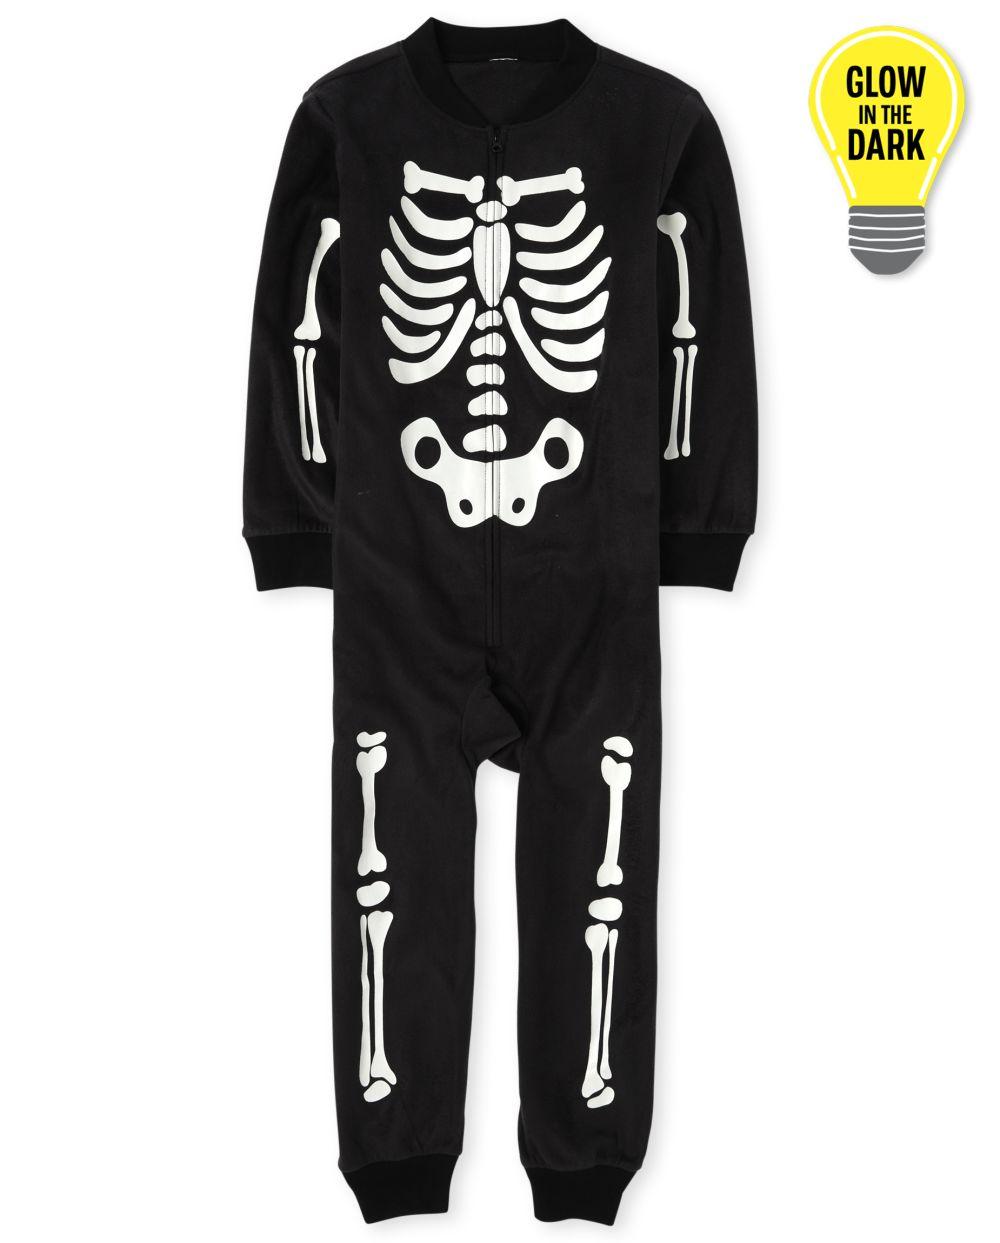 Unisex Kids Matching Family Glow Skeleton Fleece One Piece Pajamas - Black